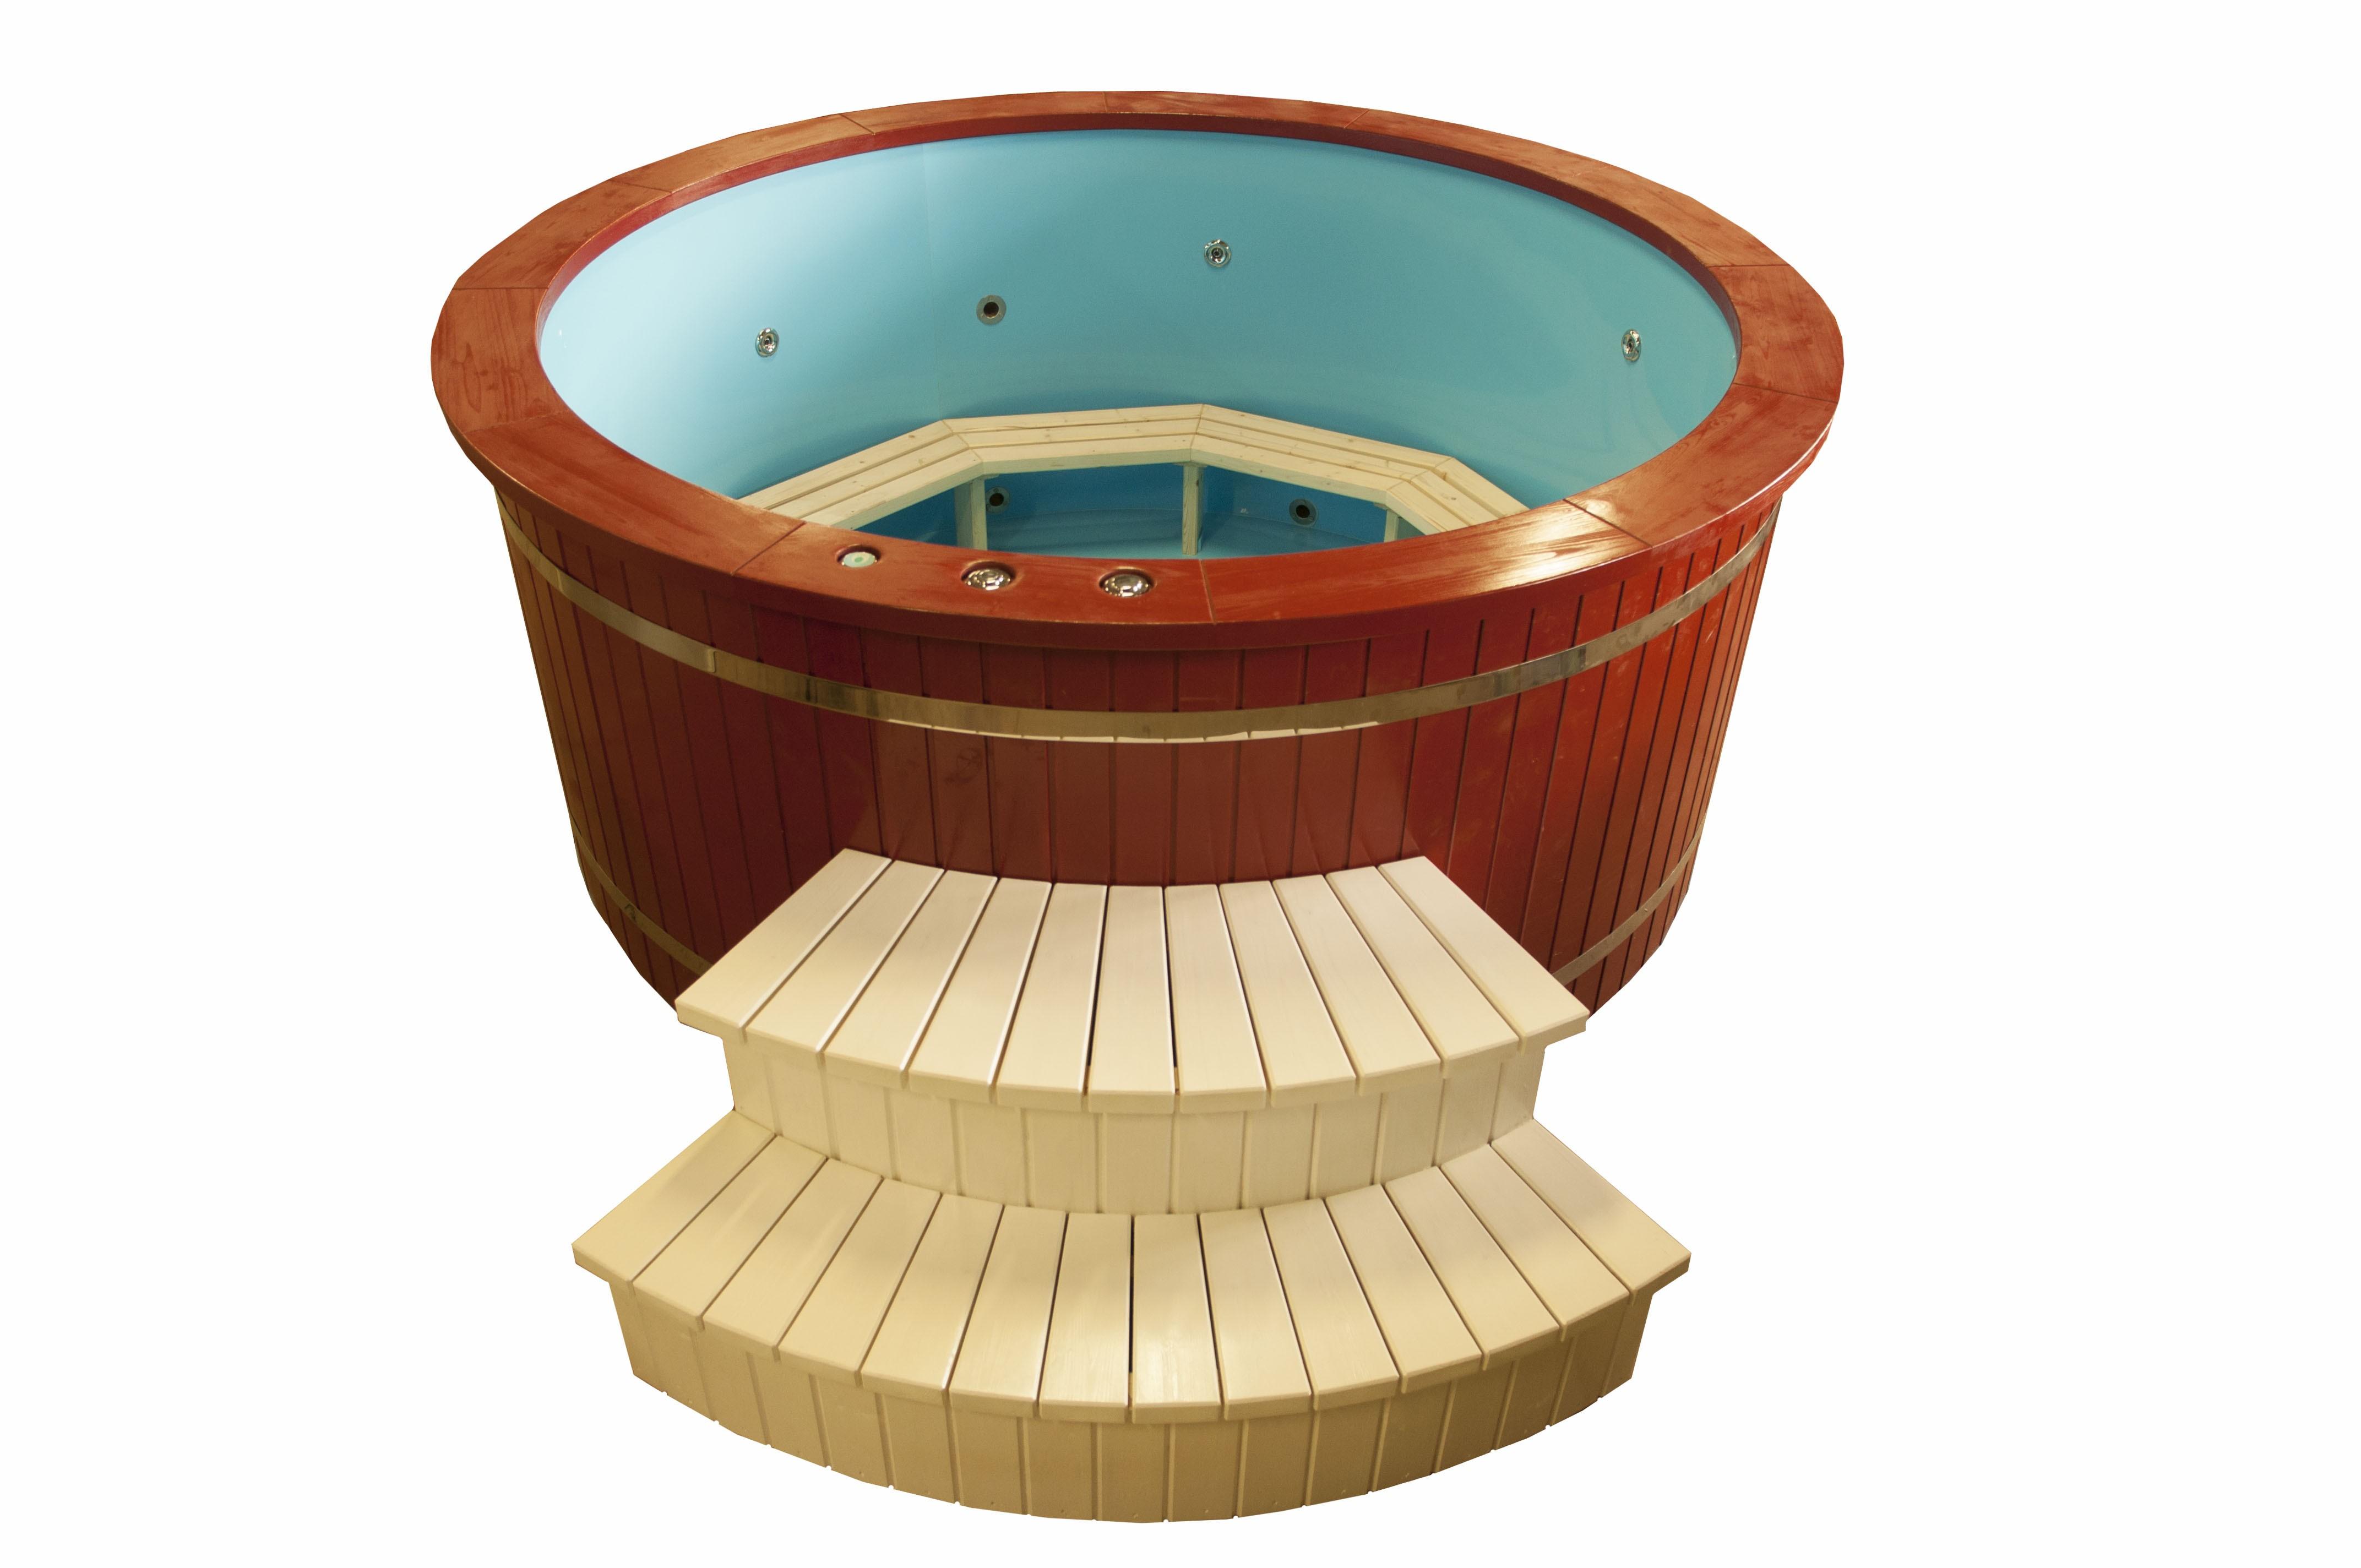 Vasca da esterno prezzi vasca da bagno esterna vasca da bagno esterno fai te come avere with - Vasche da bagno in legno prezzi ...